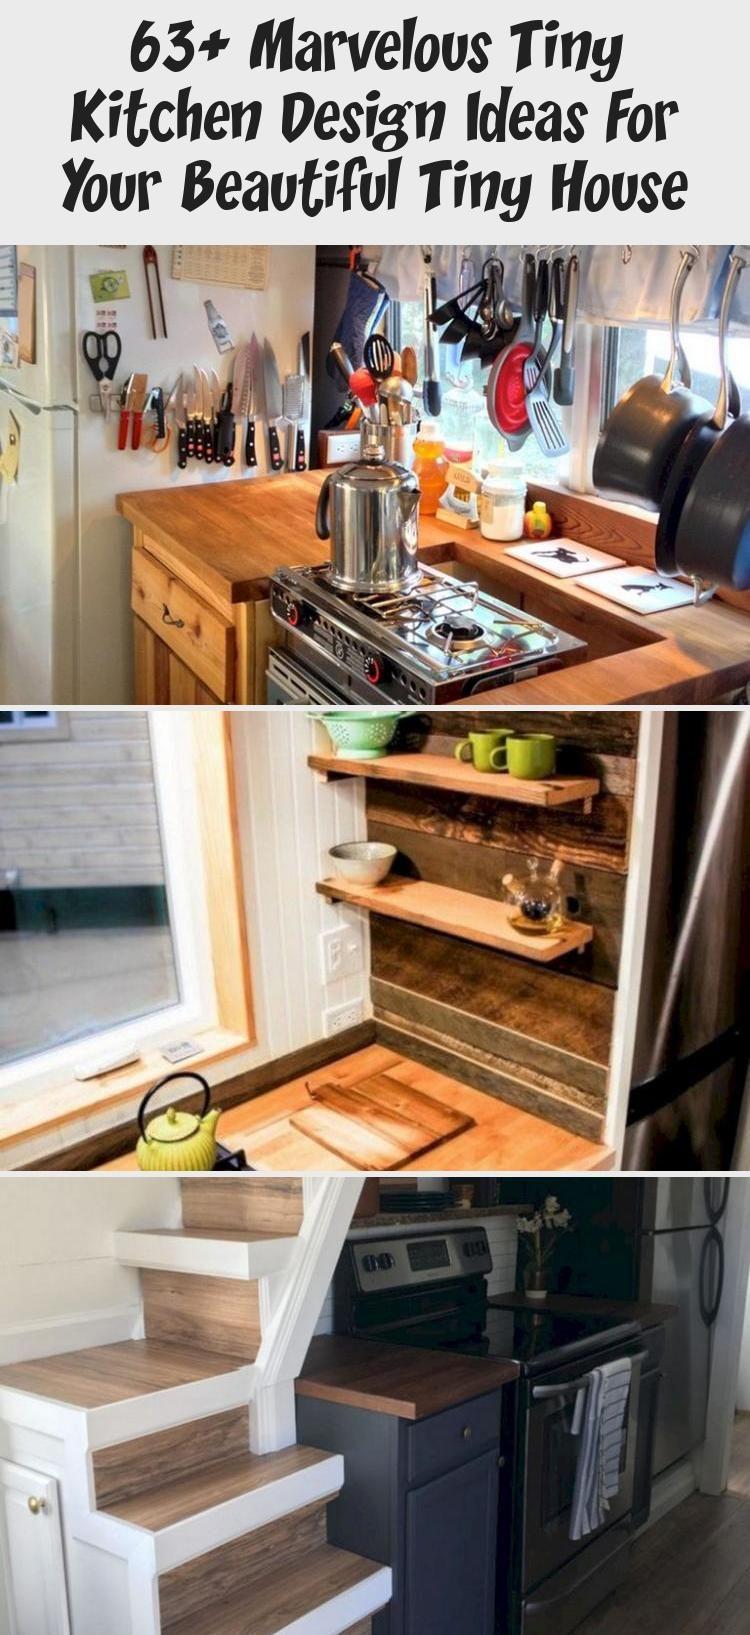 63 Marvelous Tiny Kitchen Design Ideas